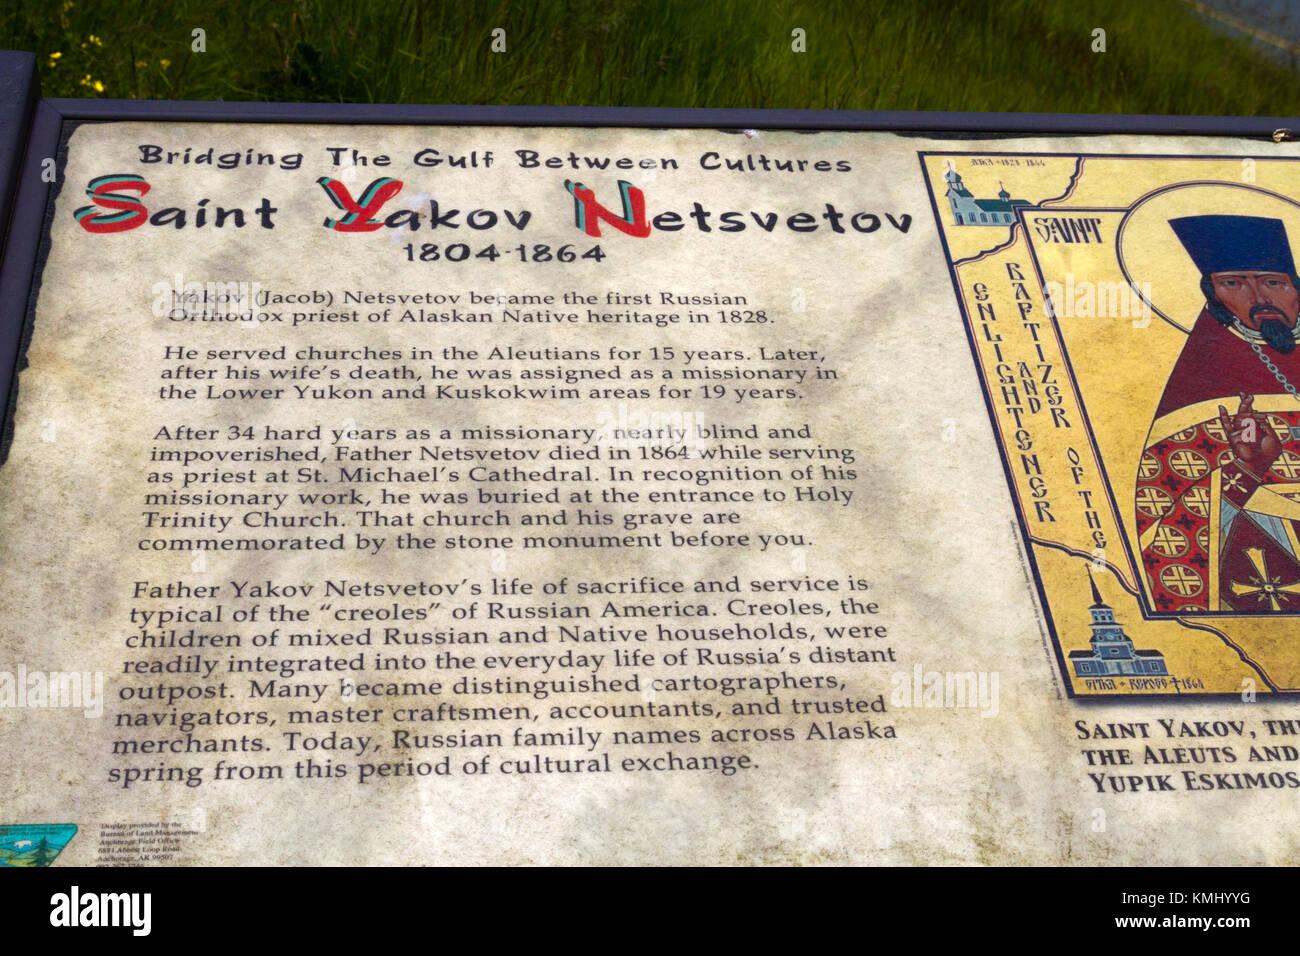 Information placard at grave site of Saint Yakov Netsevetov in Sitka, Alaska. - Stock Image